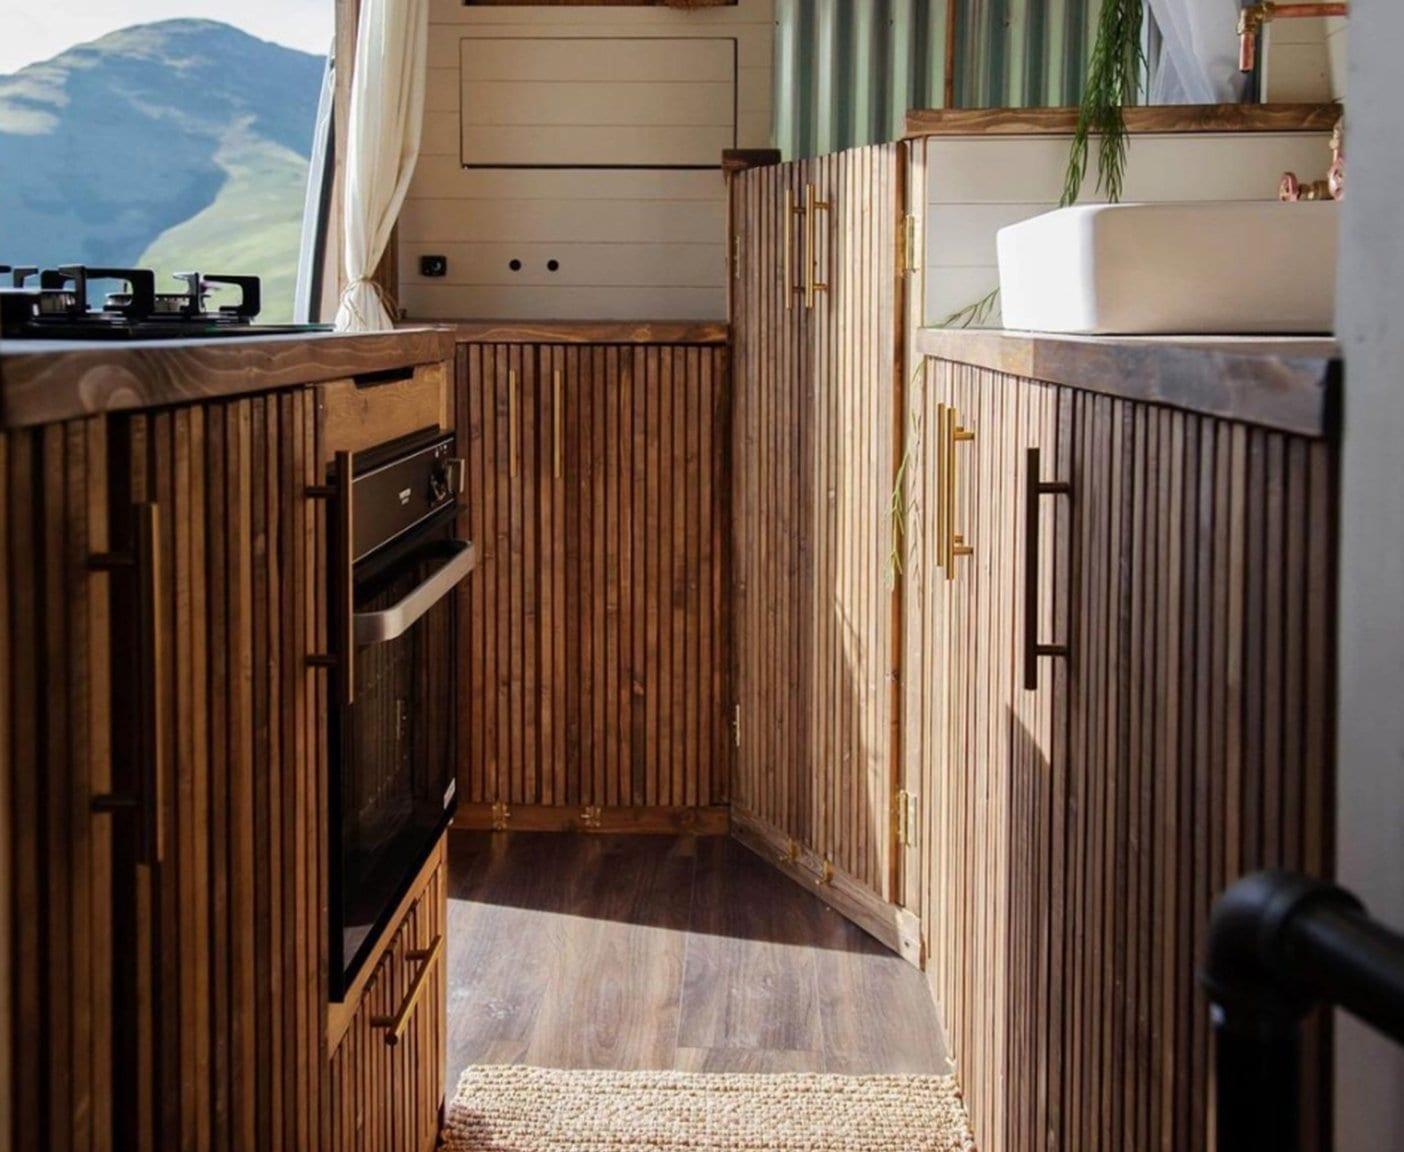 wohnmobil-kueche-selber-bauen-wohnwagen-ikea-kuechenmodule-camper-gebraucht-kaufen-minikueche-einrichten-kuechenblock-kuechenausstattung